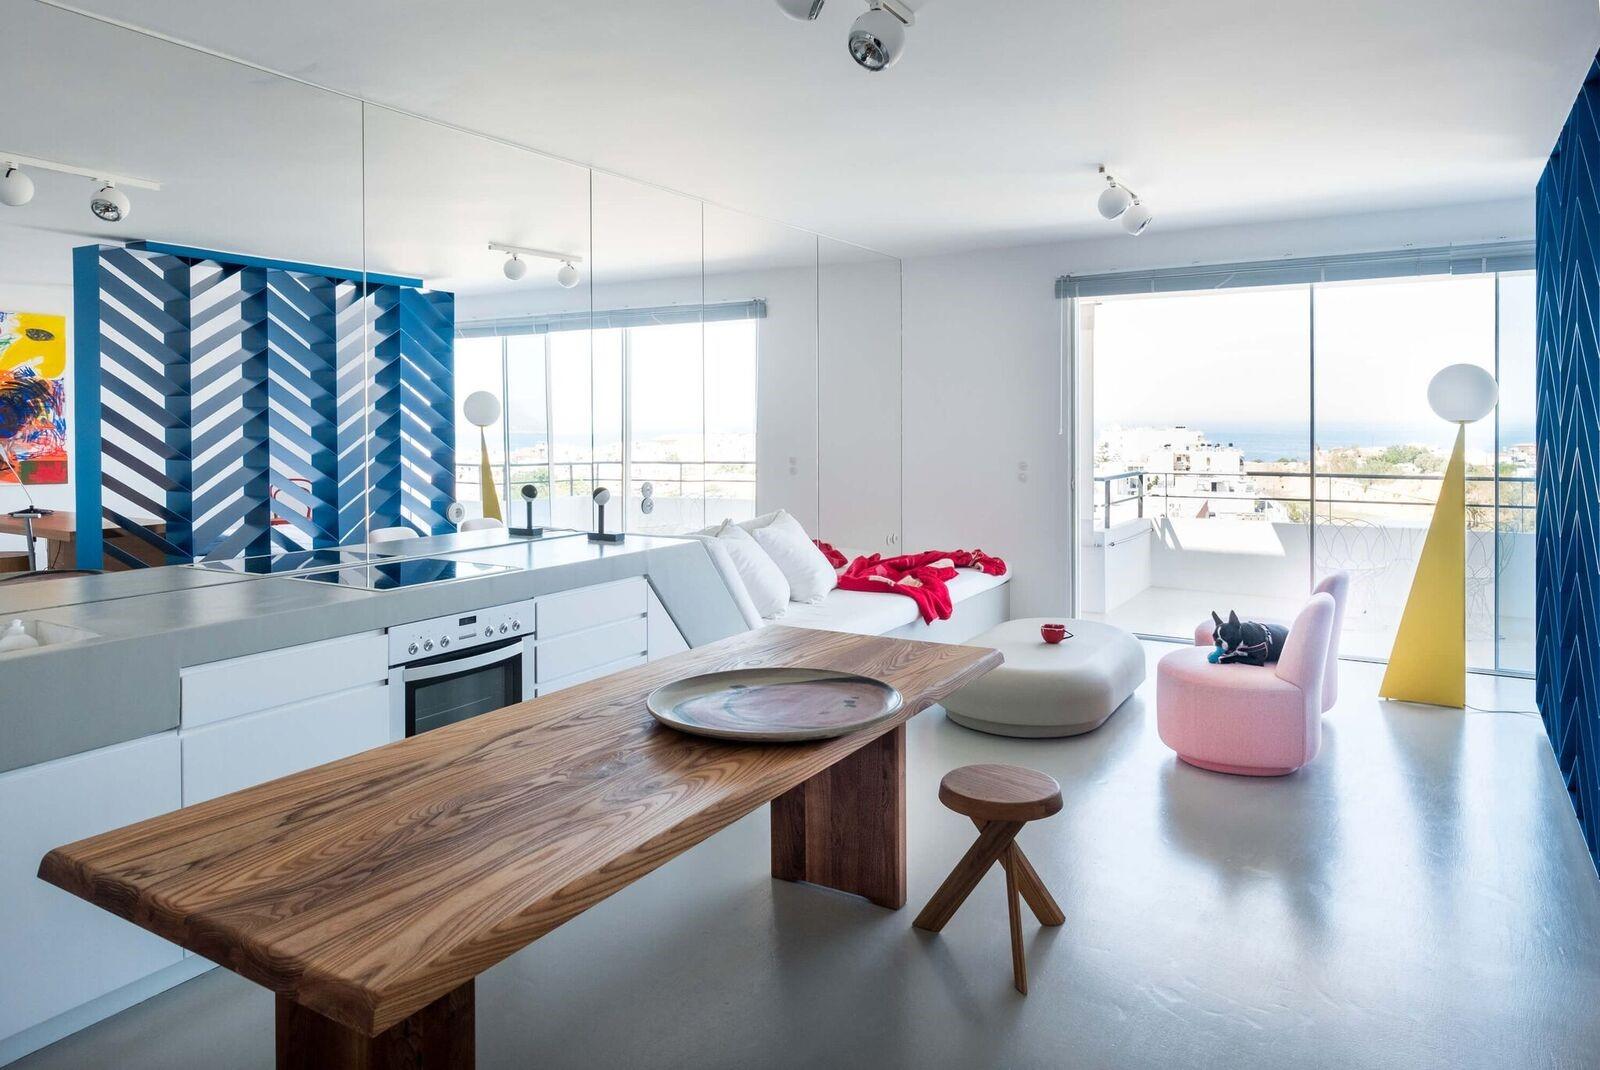 Bonhomme     floor light | 176OL-F01 Ammos Hotel